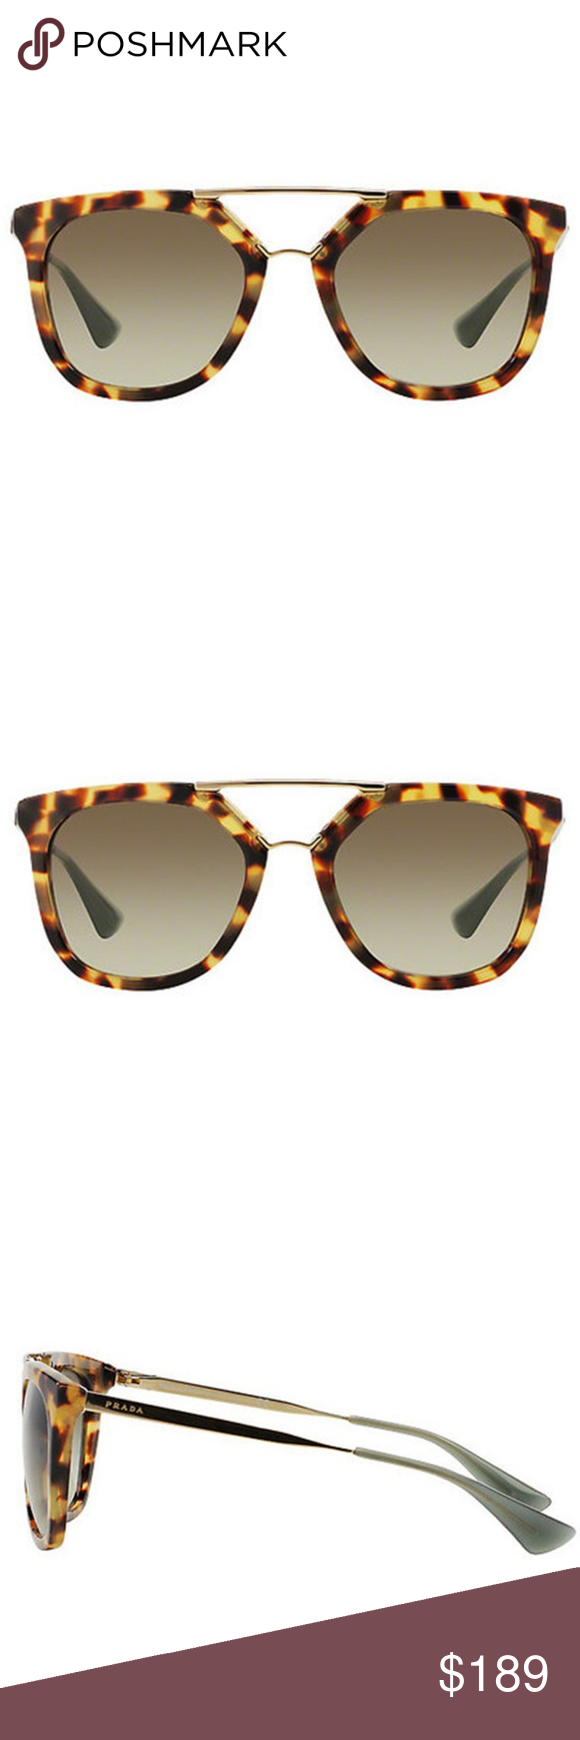 0fcfd559c6 Prada Sunglasses Medium Havana w Green NWT in 2018